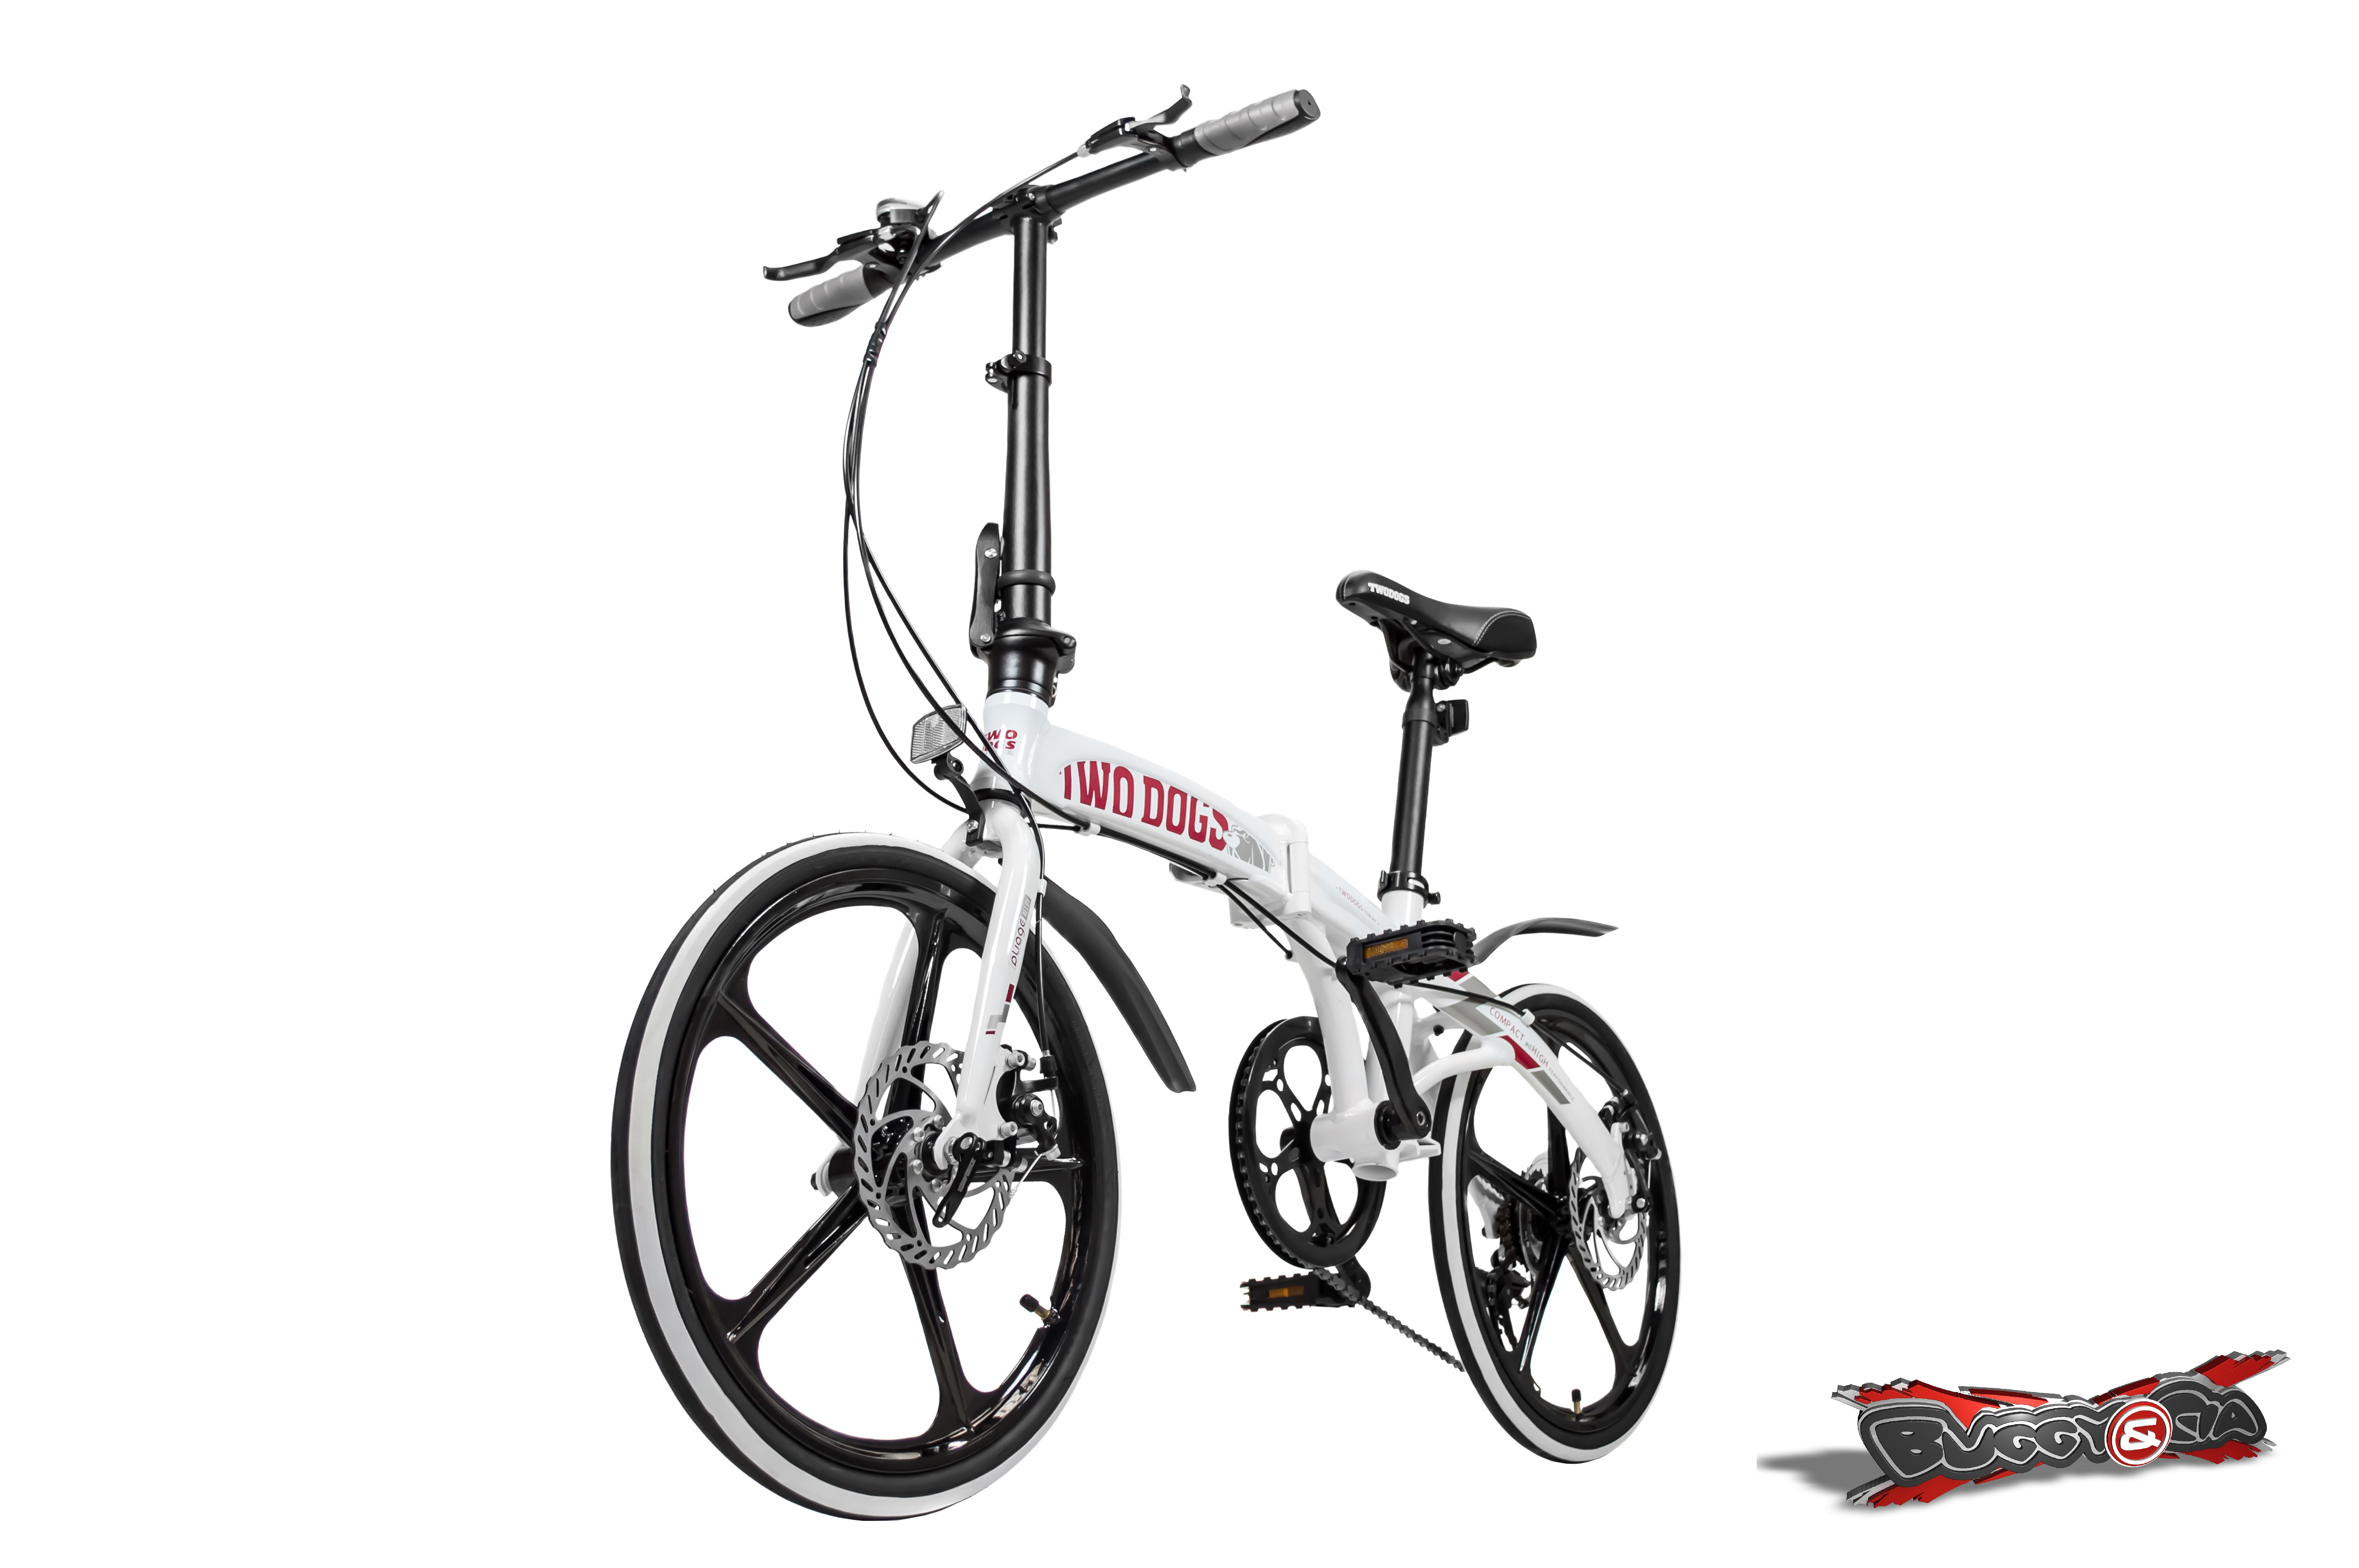 Bicicleta Pliage Alloy - Alumínio